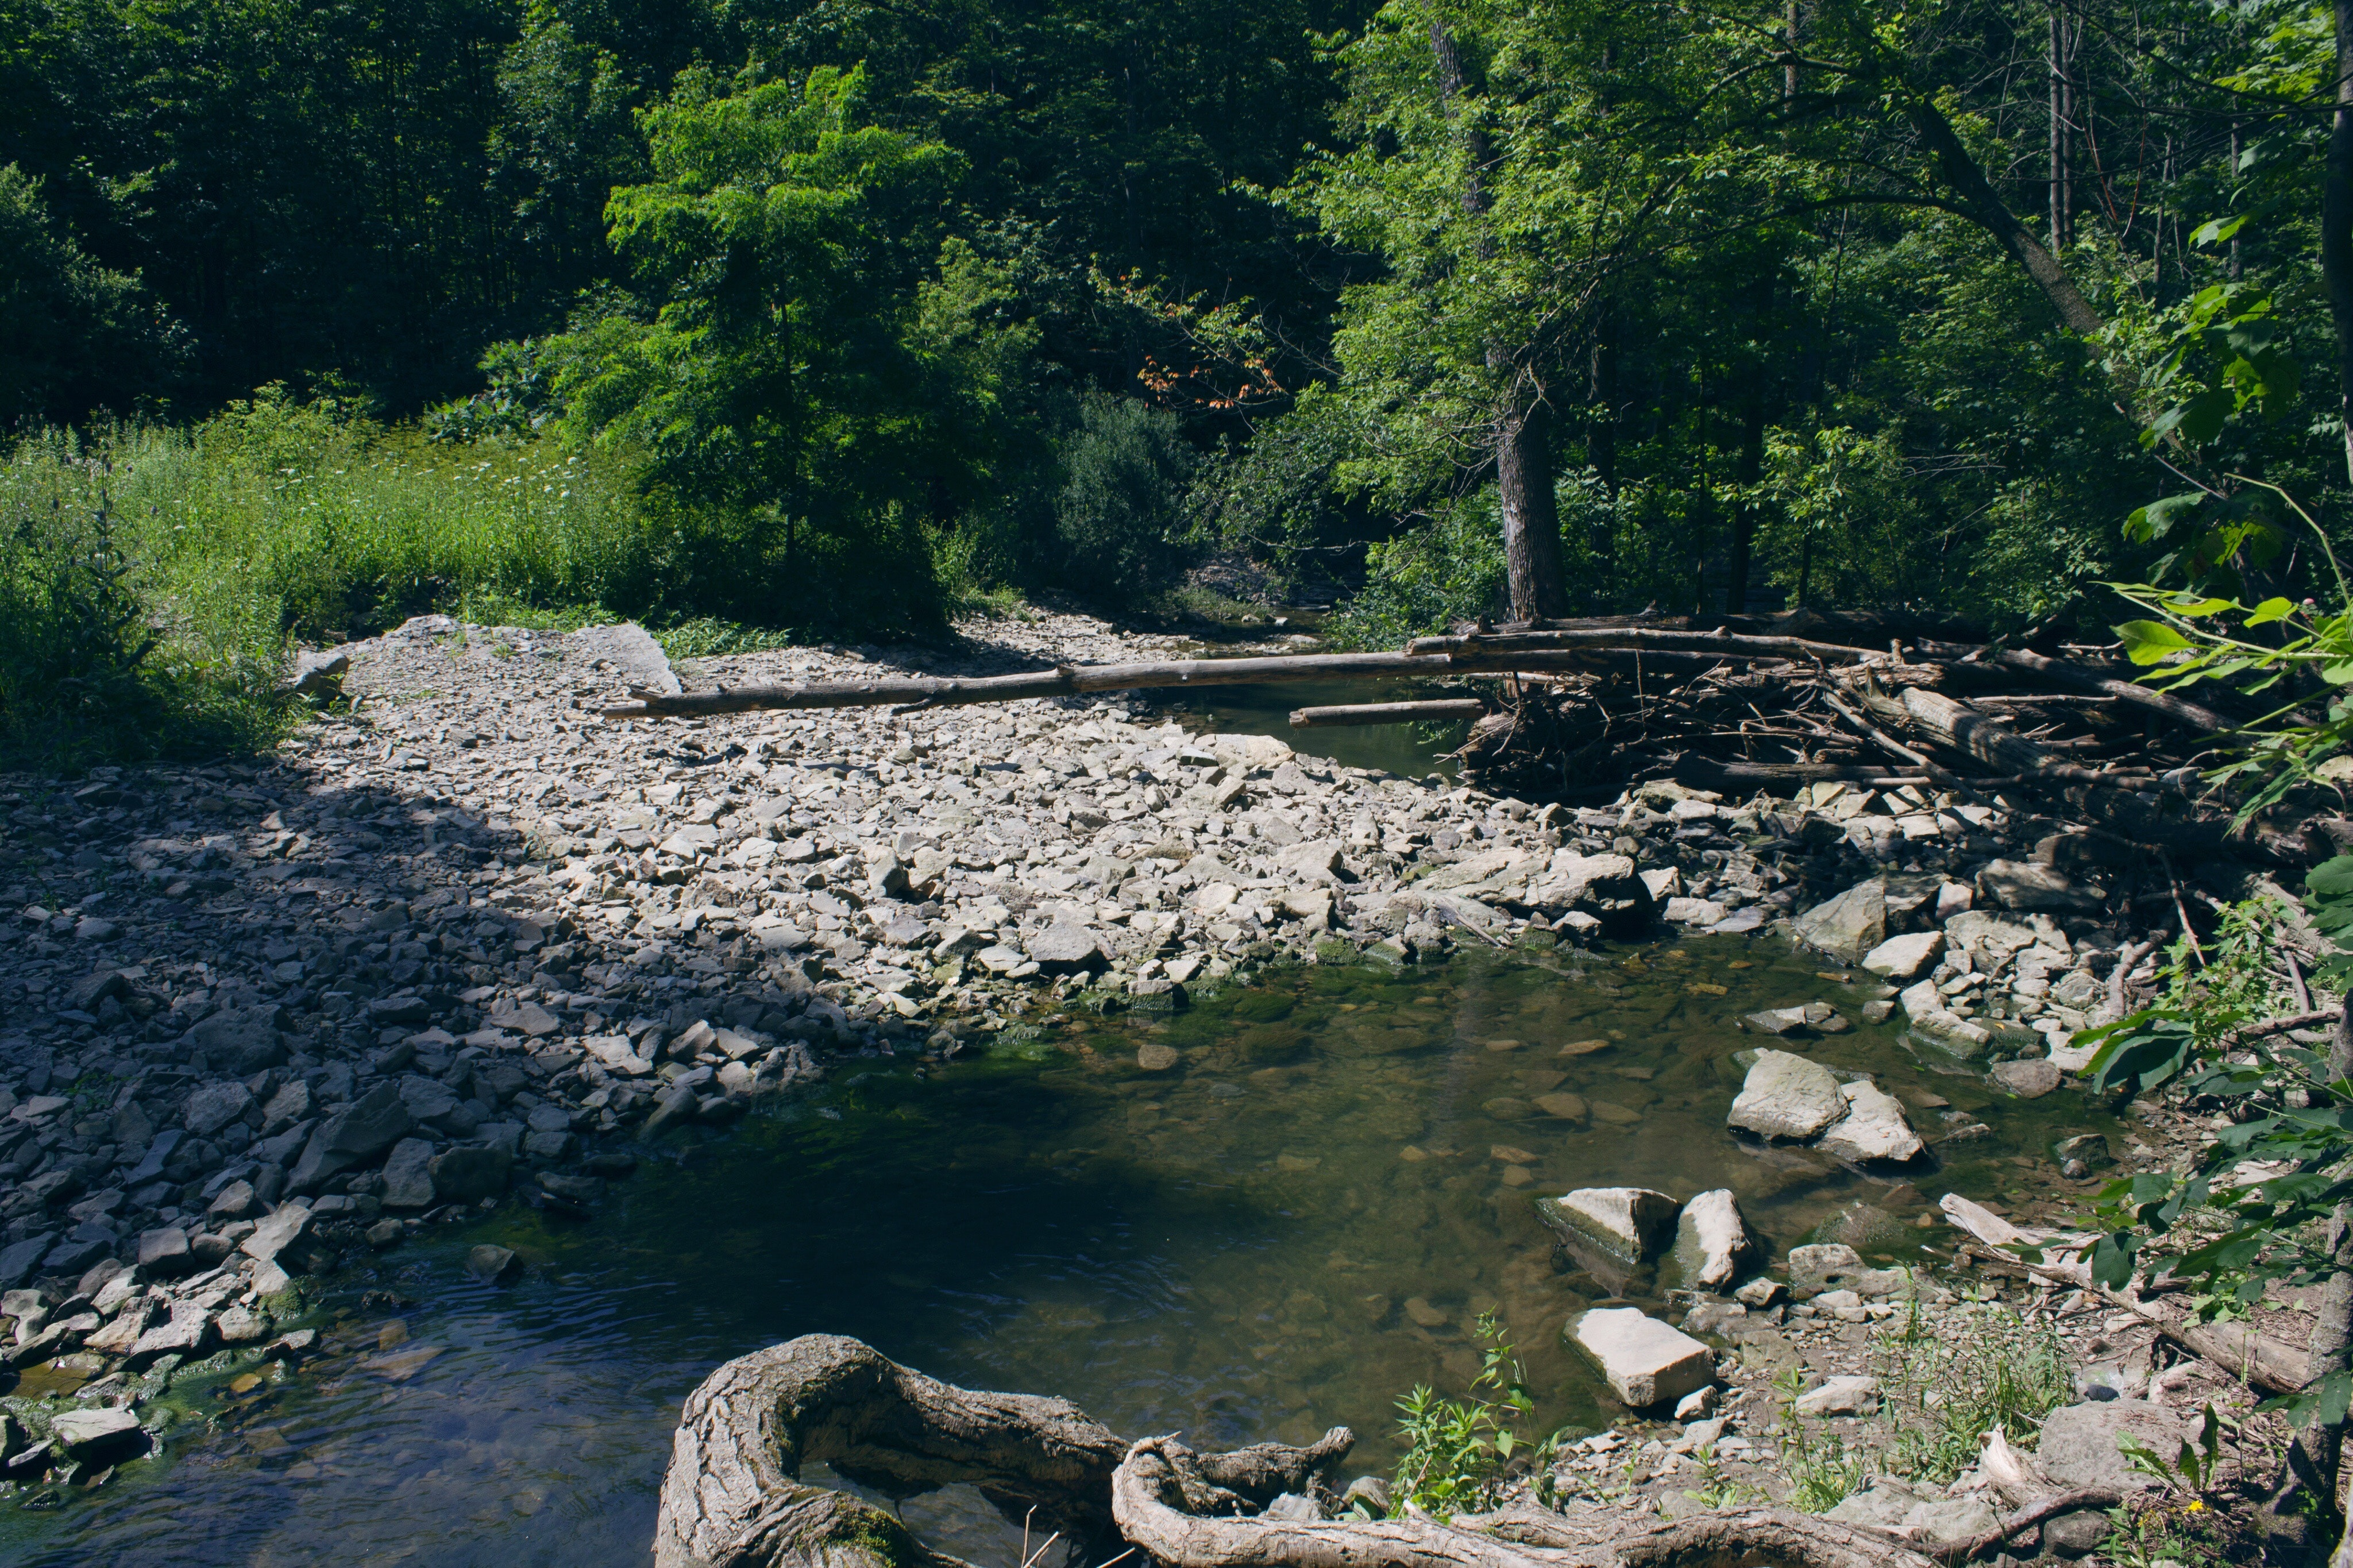 Stream between forest photo